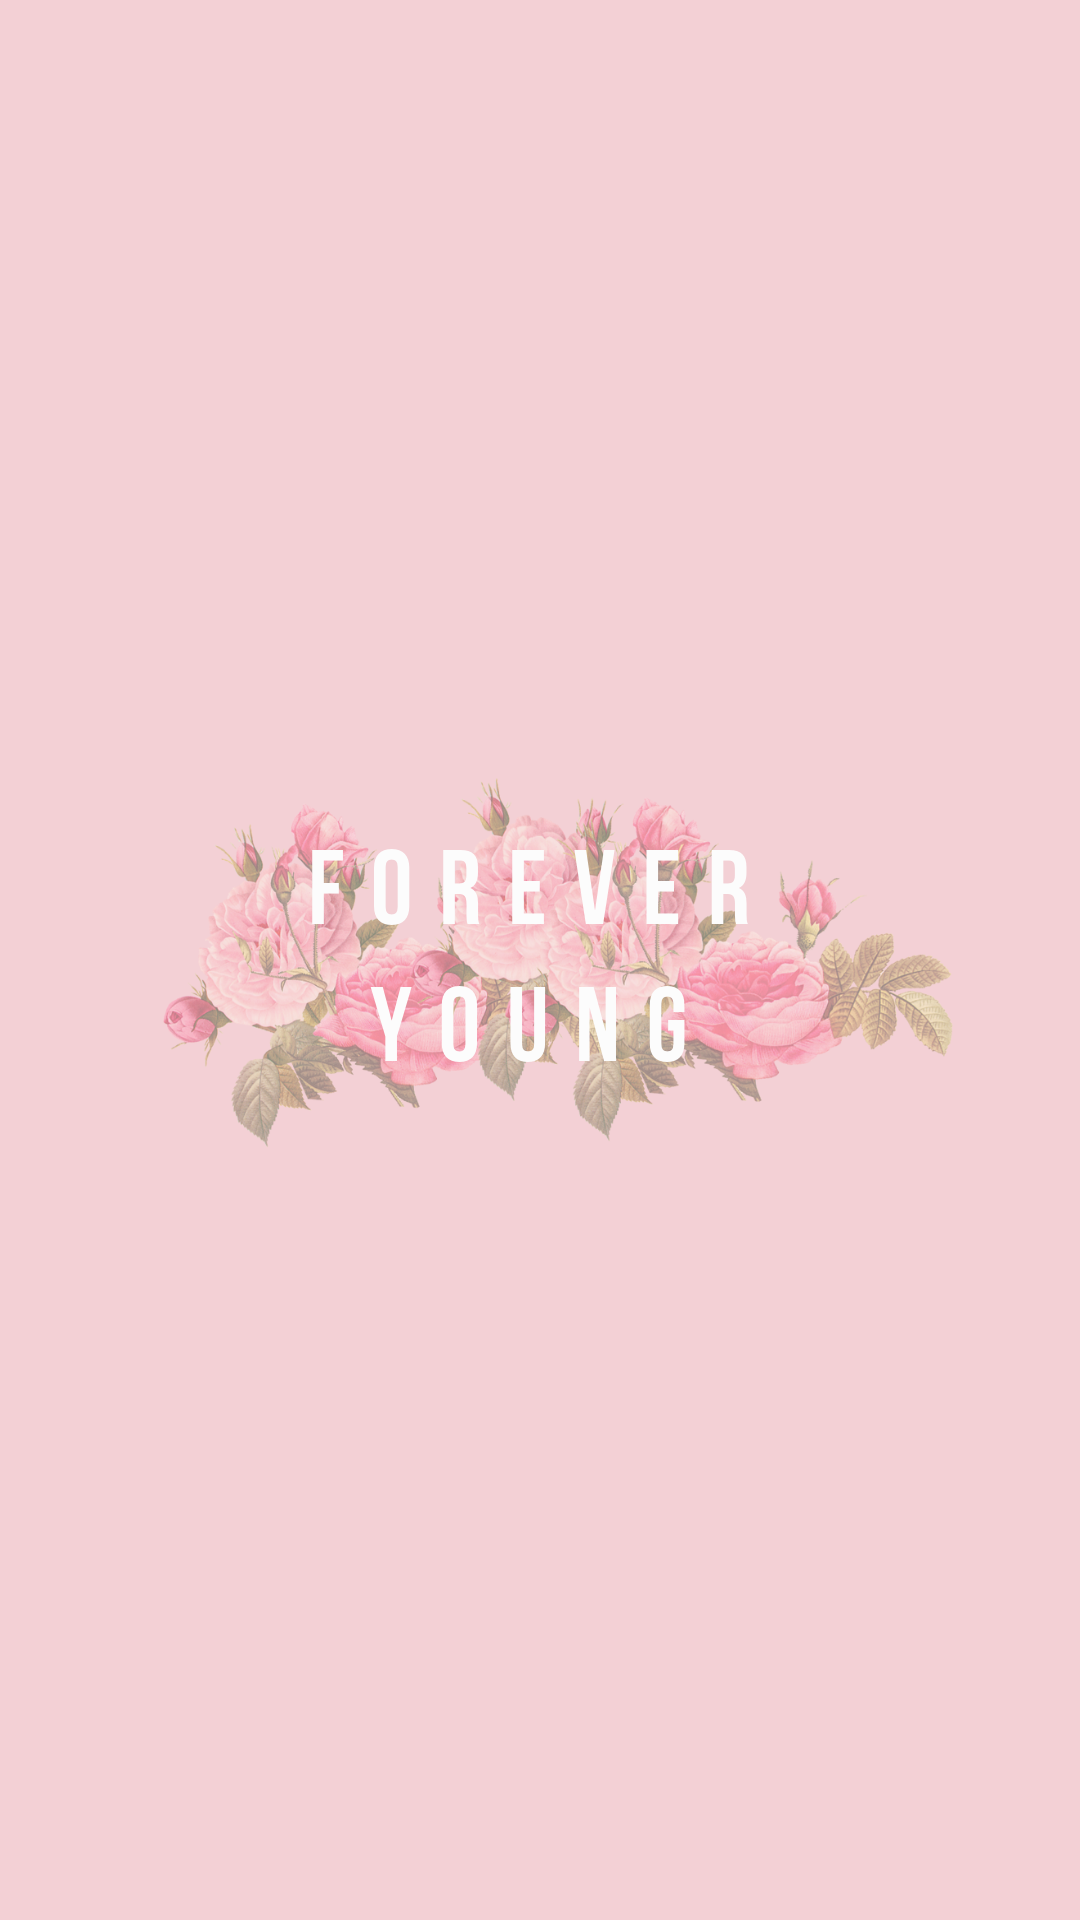 Https Cakedits Tumblr Com Post 178213500588 Blackpink Minimalist Lyrics Wallpaper 6 V Background Wallpaper Tumblr Pink Wallpaper Iphone Wallpaper Iphone Cute